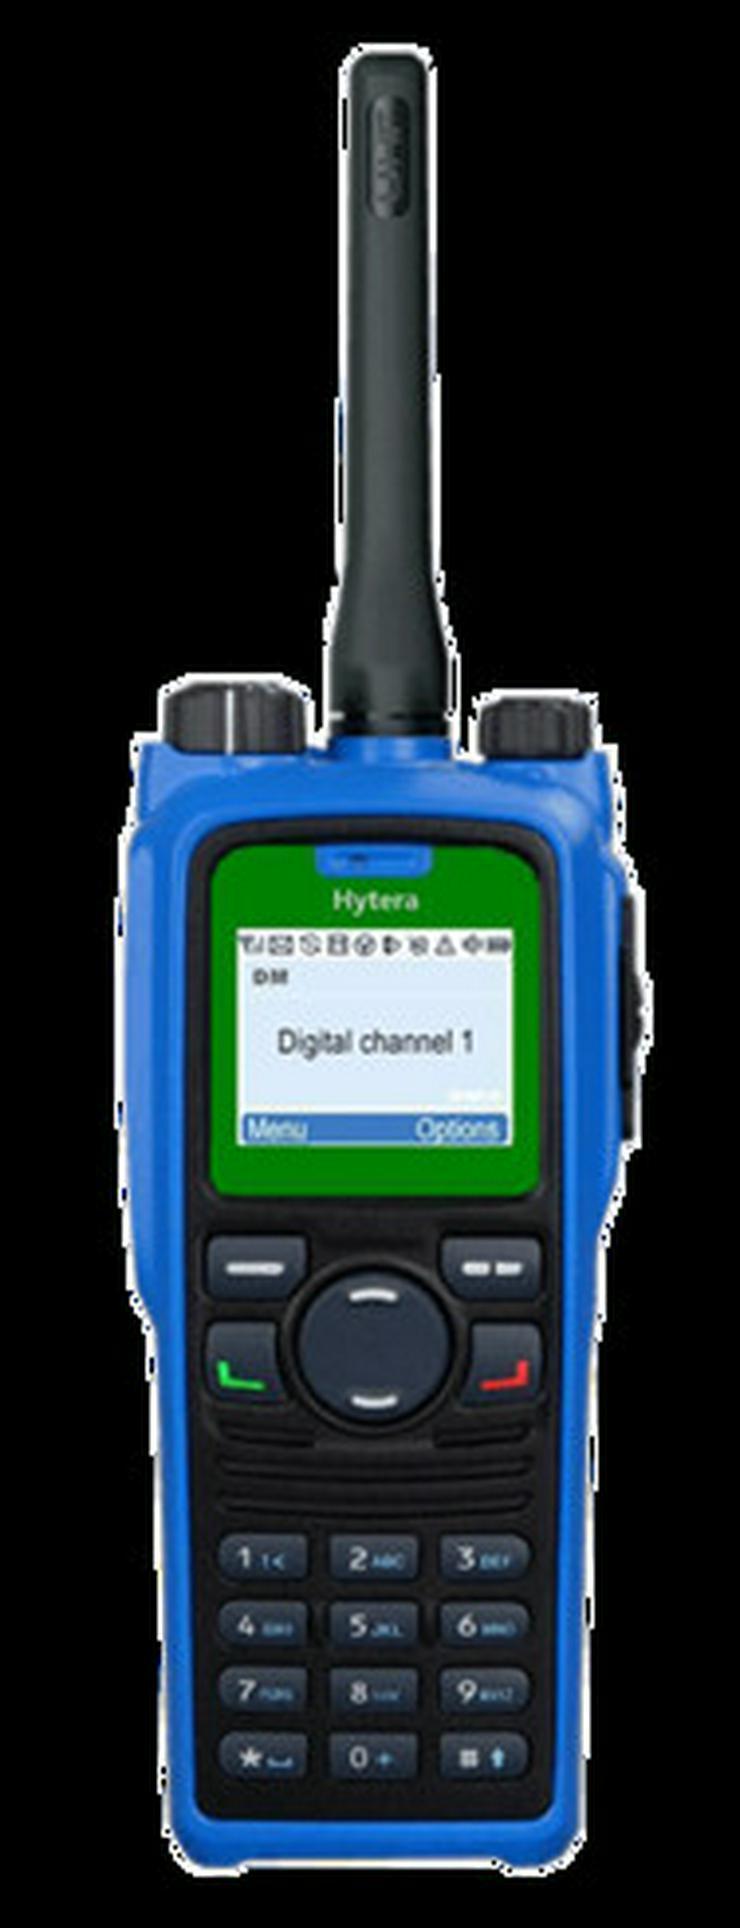 Bild 5: TC 620 Analoges hytera UHF Betriebsfunkgerät